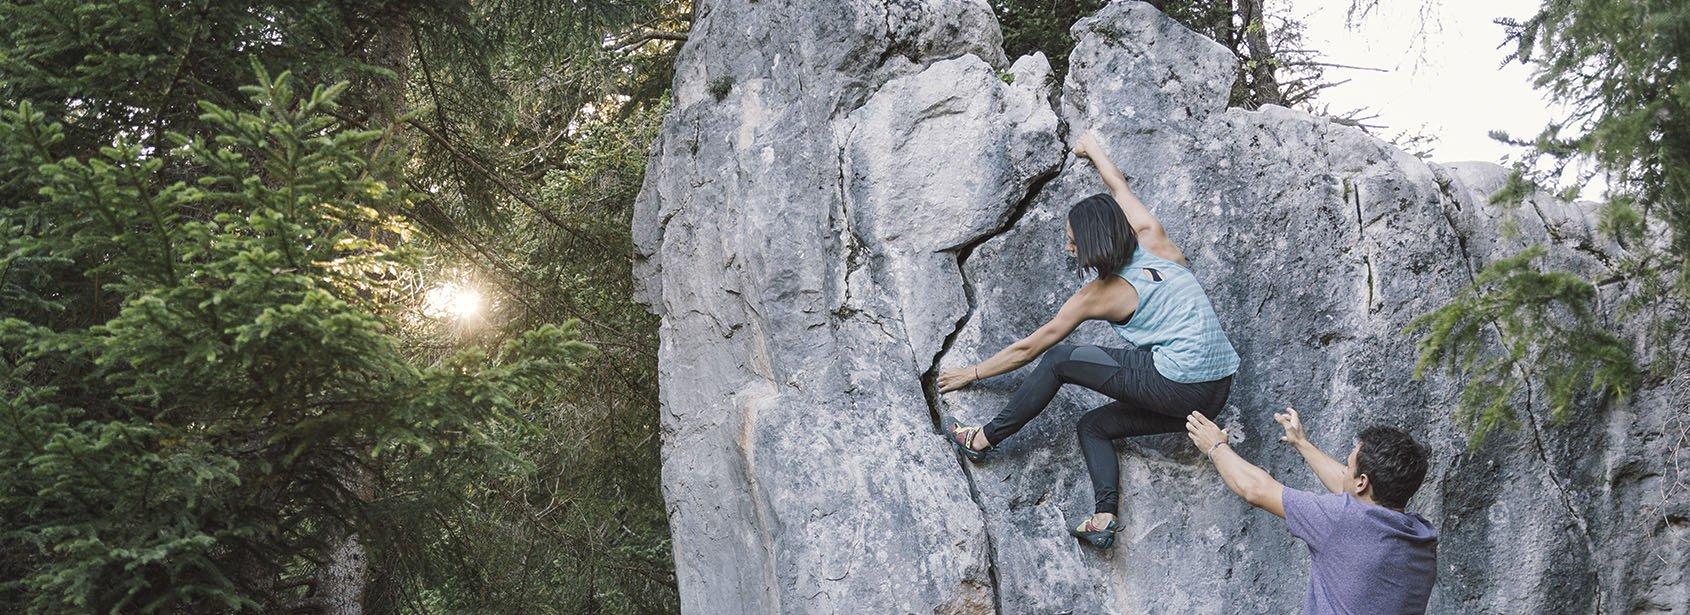 Bouldern Imst